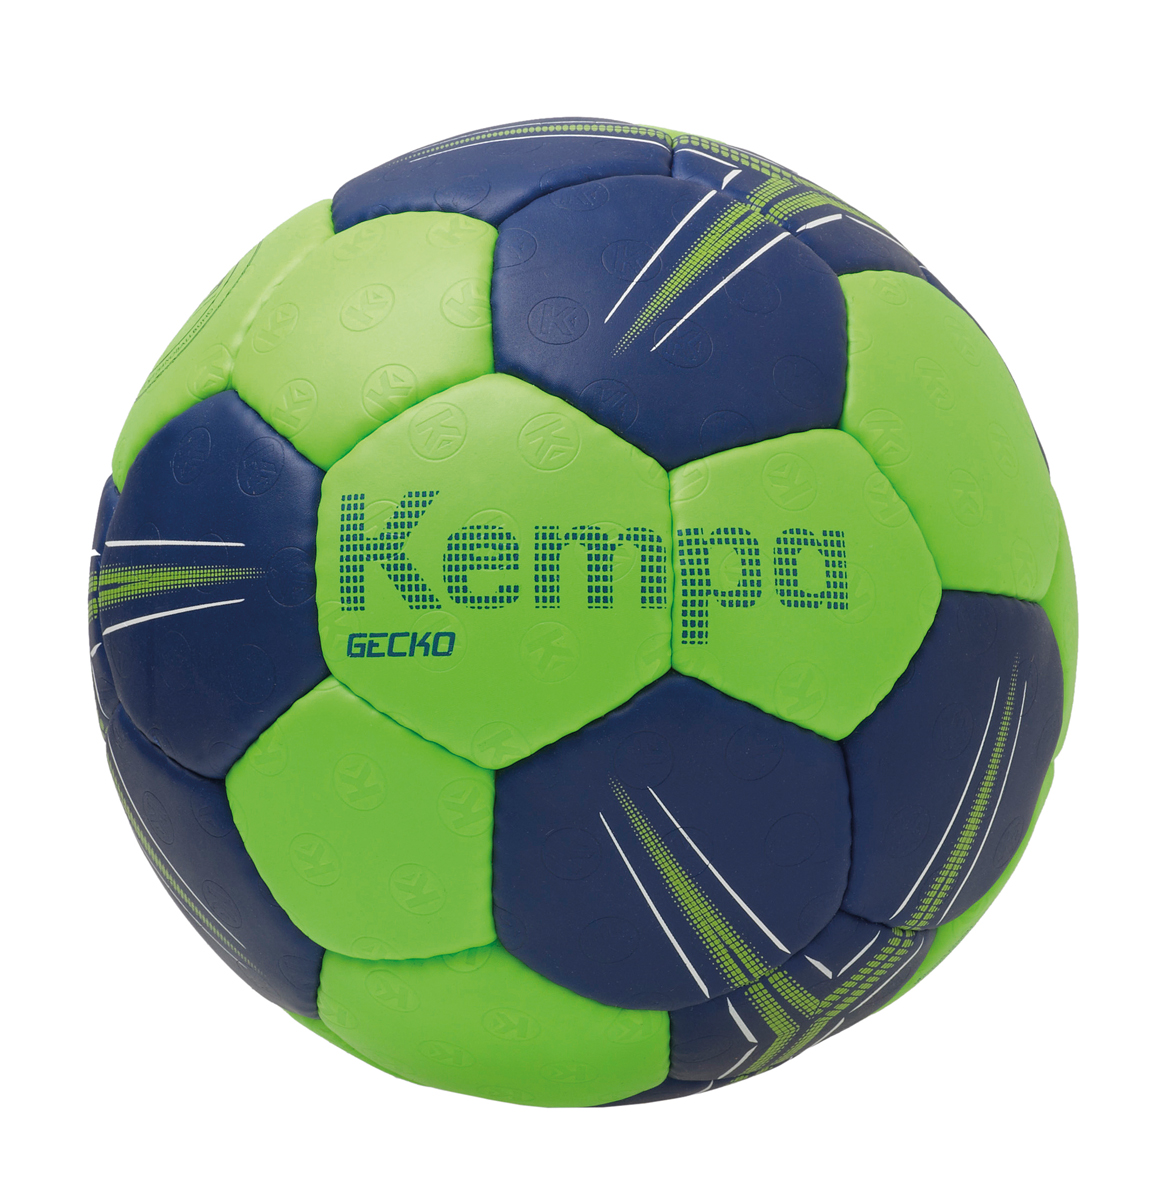 Image of   Kempa Gecko Handball - Størrelse 2 - Flash Green / Deep Blue